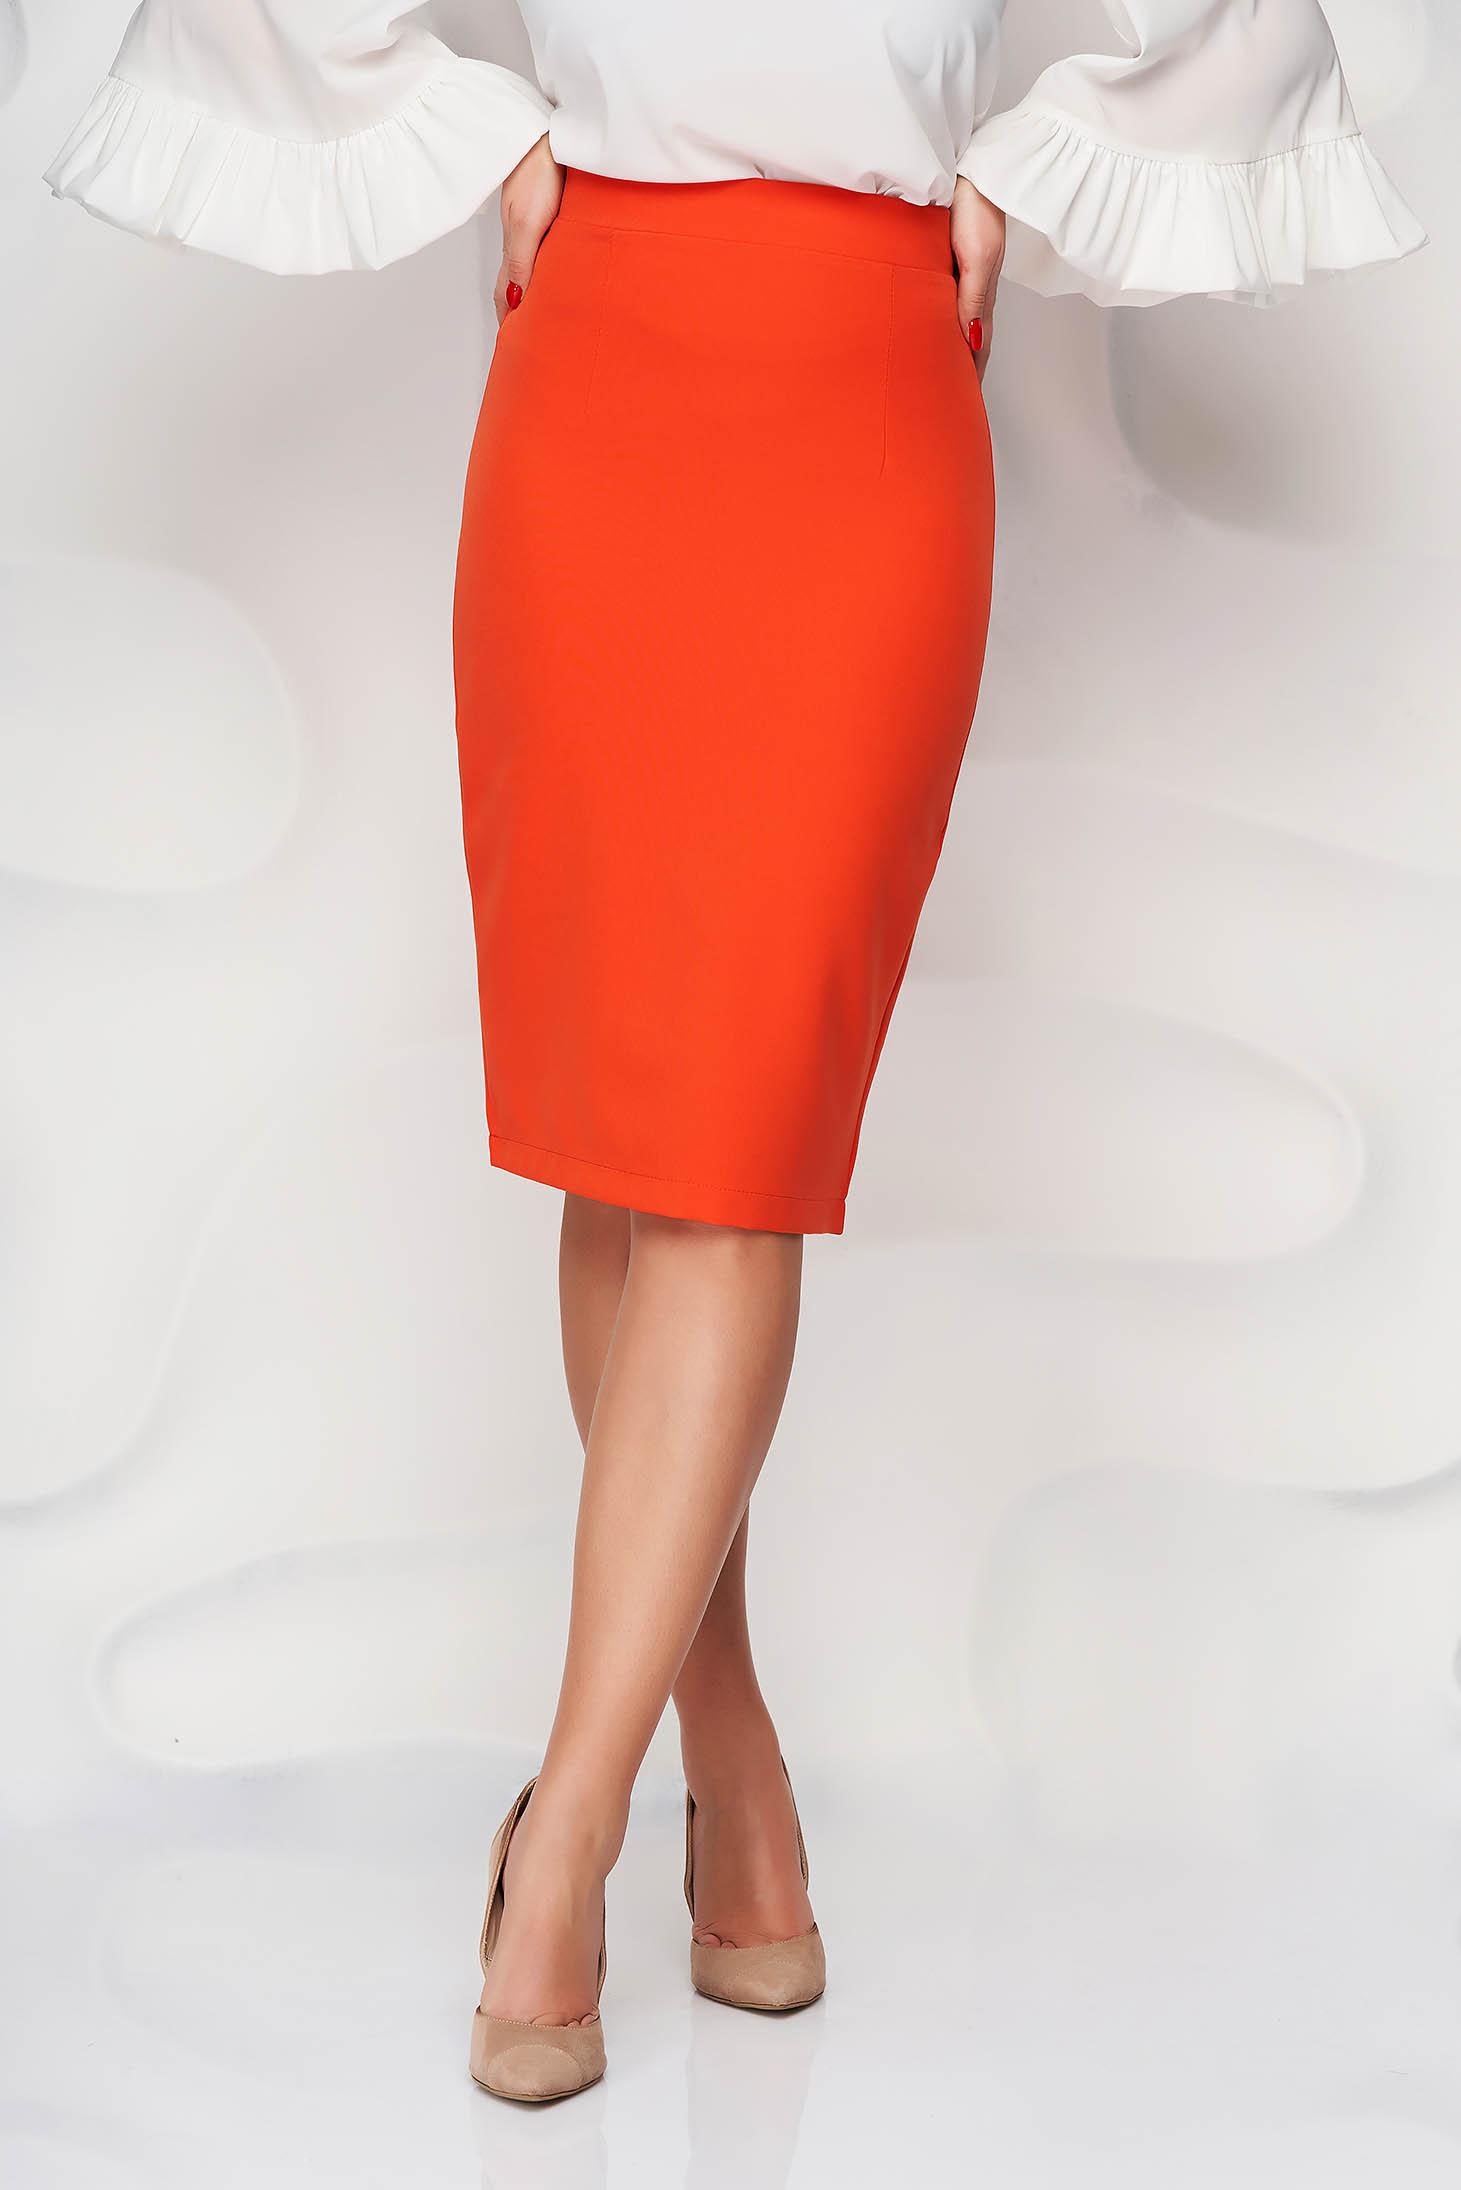 Fusta StarShinerS portocalie office midi tip creion din stofa elastica cu talie inalta